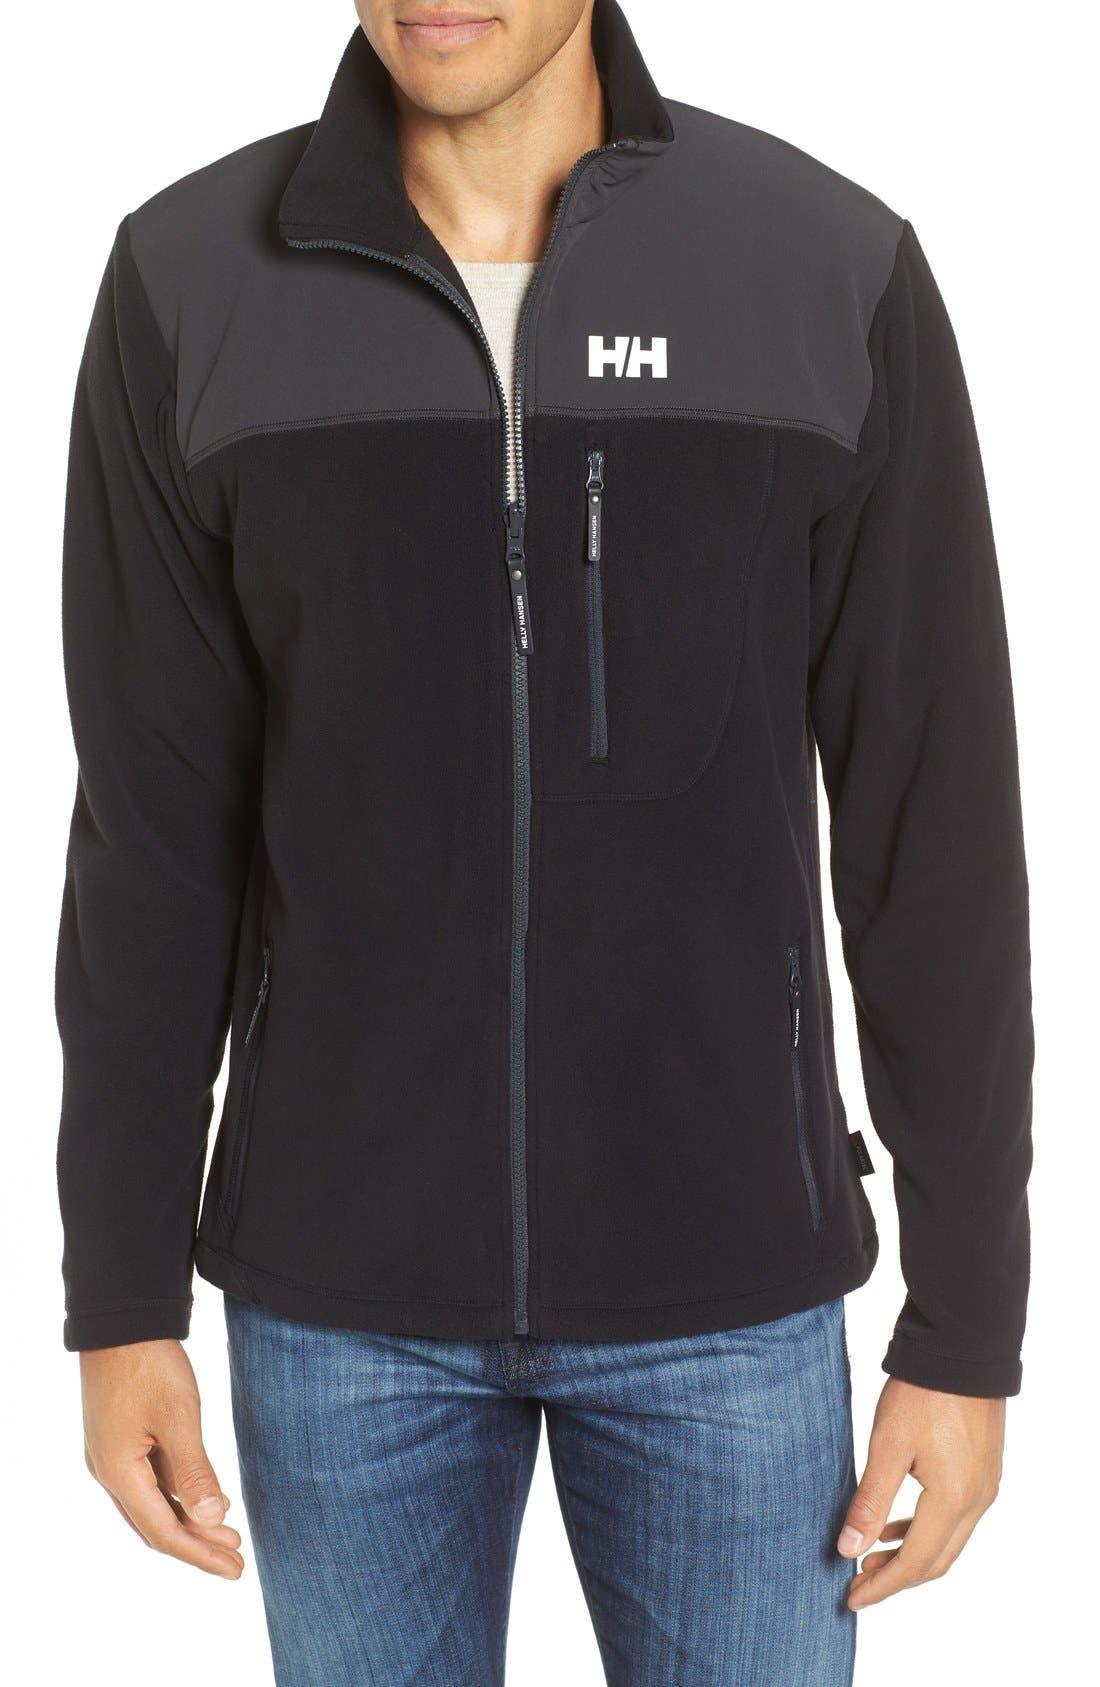 Sitka Fleece Jacket,                         Main,                         color,